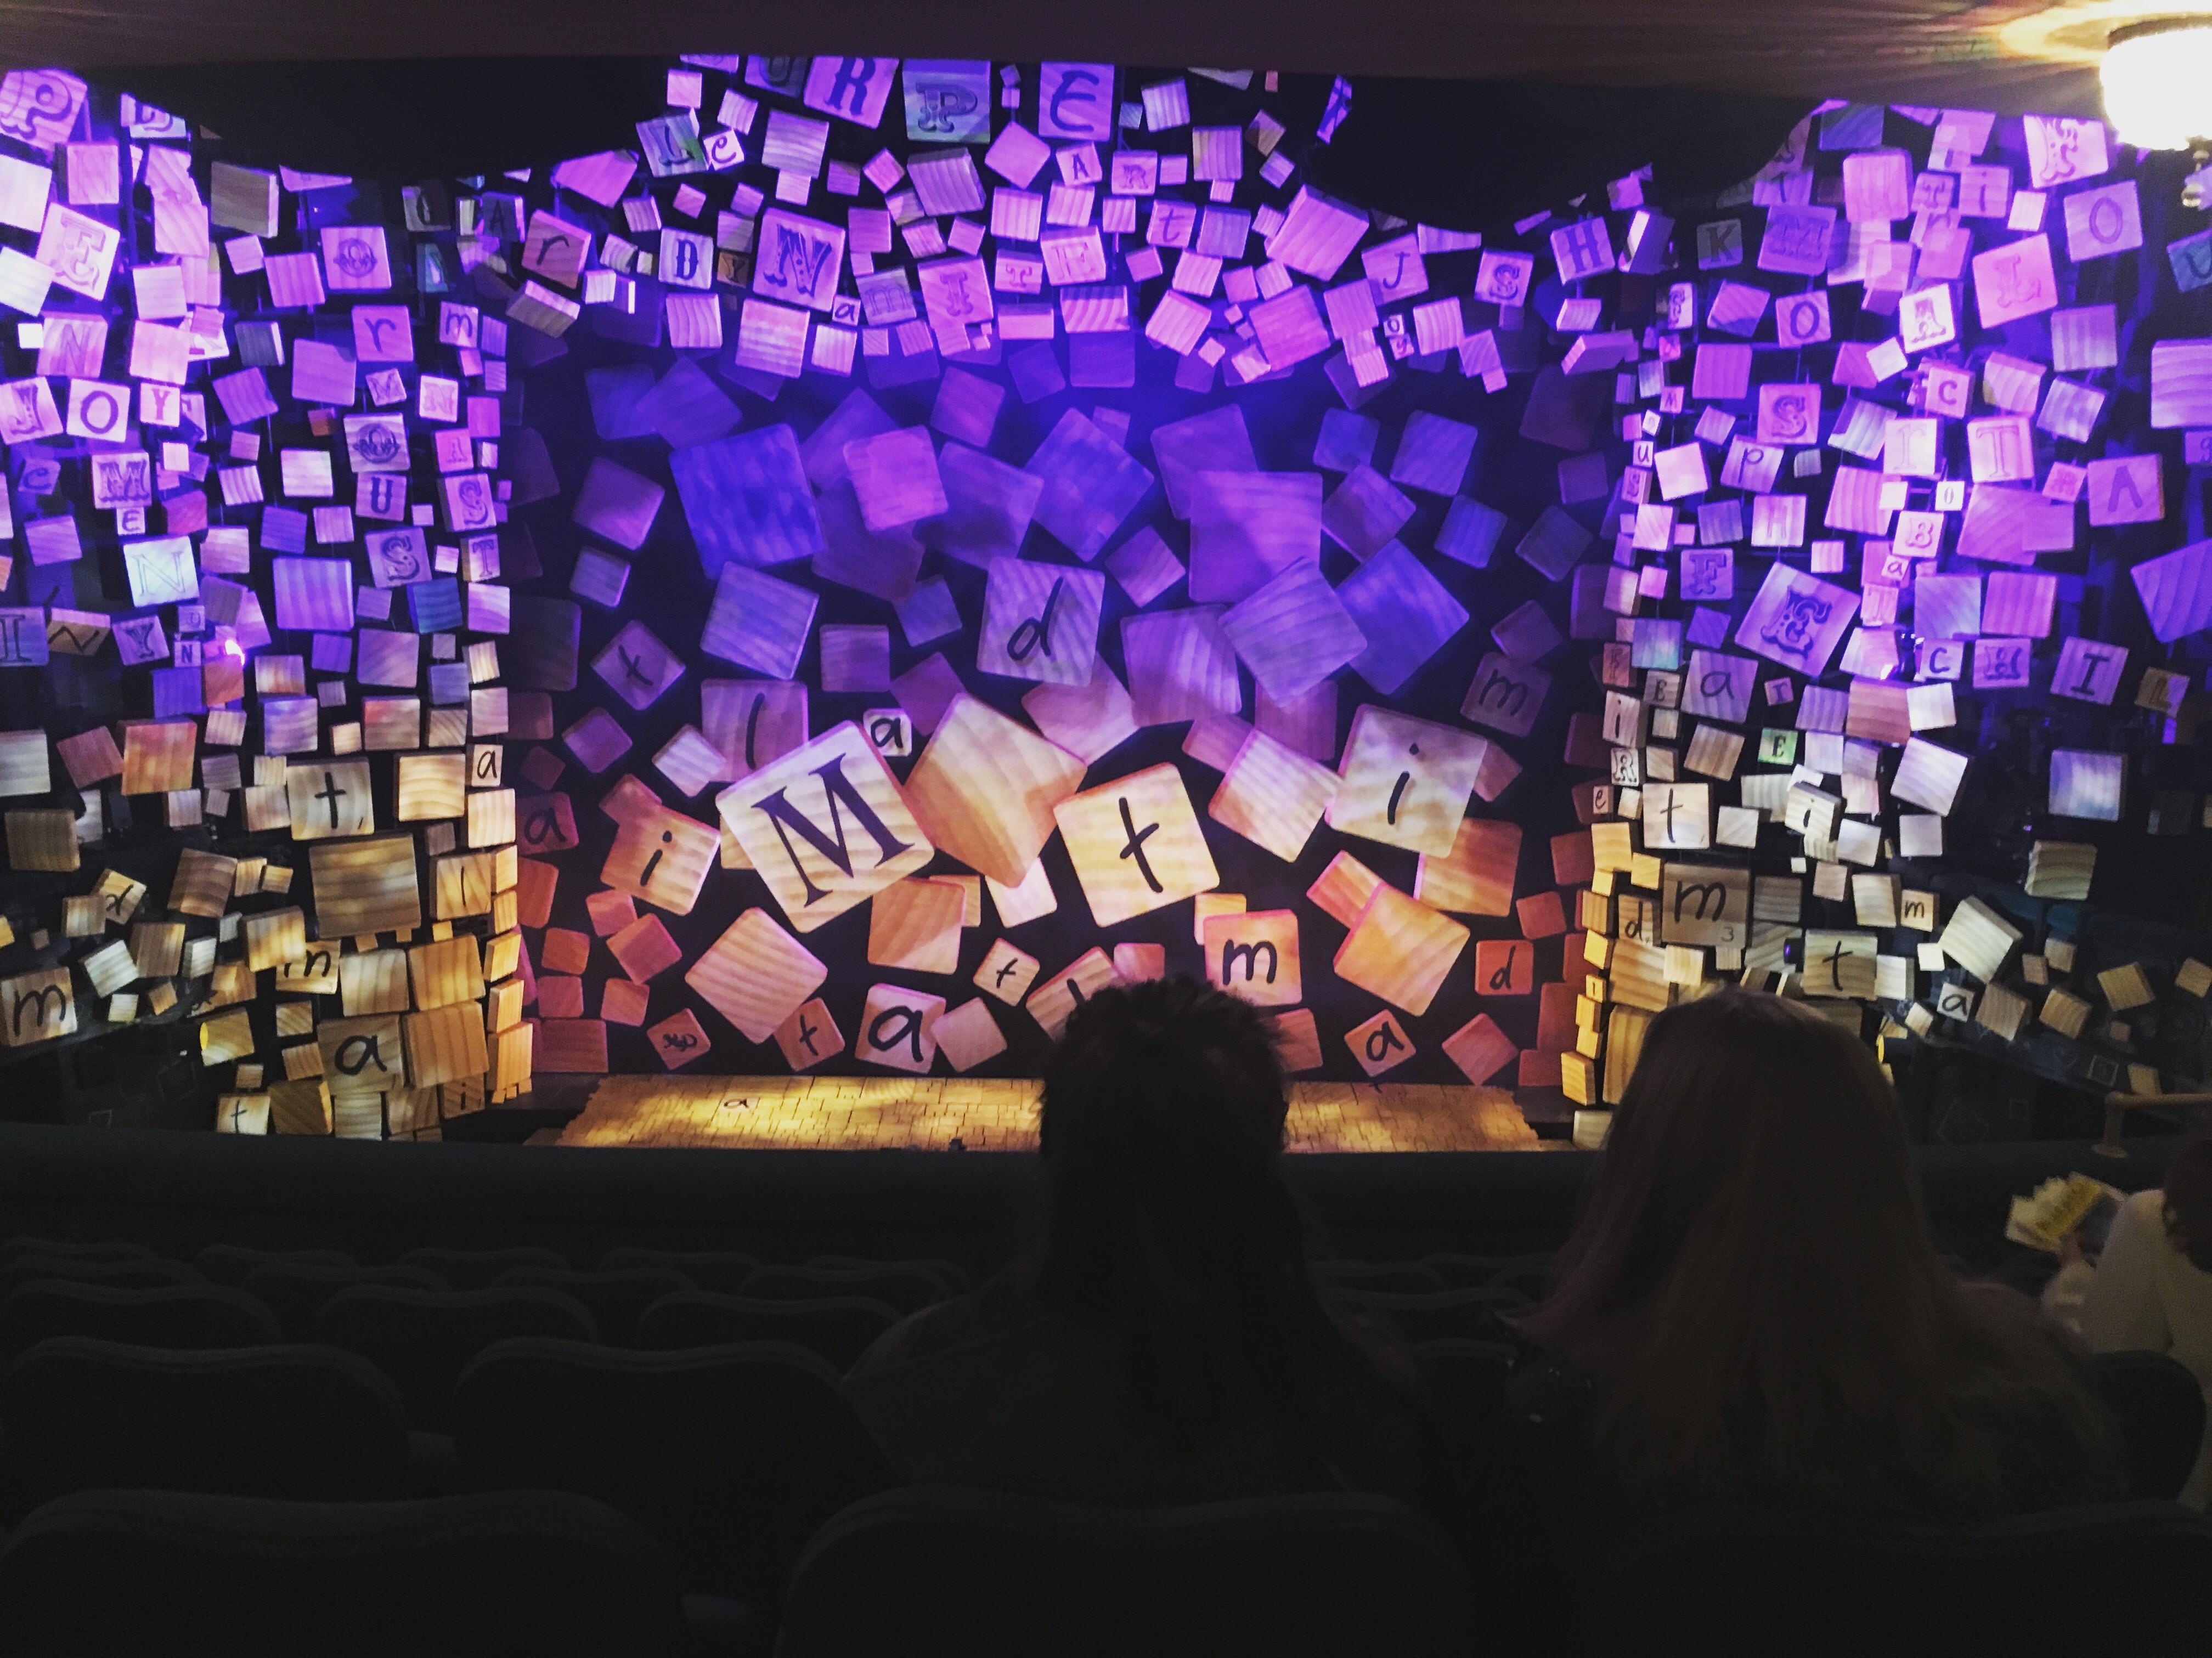 Shubert Theatre Section Mezzanine Row G Seat 107